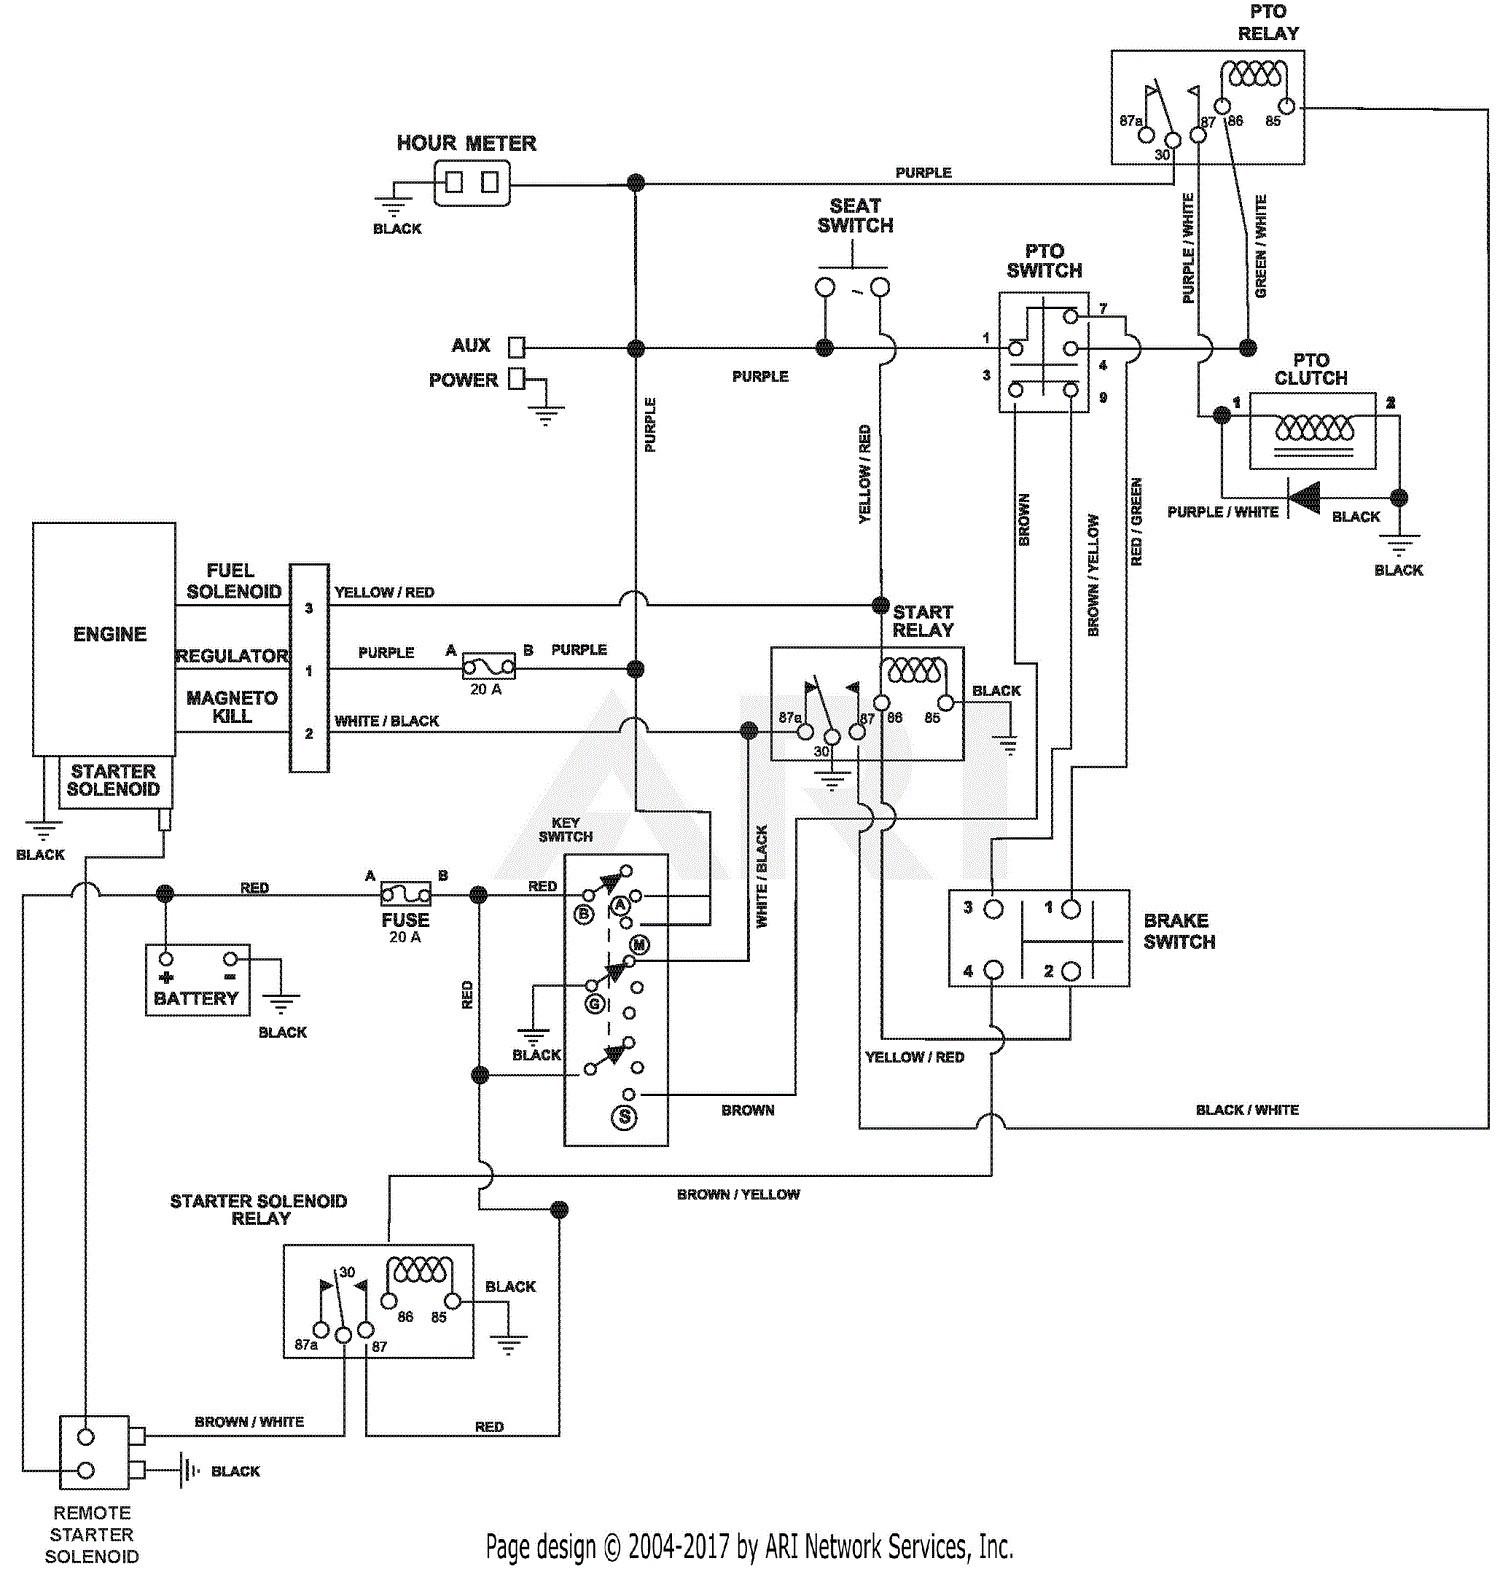 Wright Stander Ws36ffs600e Wiring Diagram Wright Stander Wiring Diagram